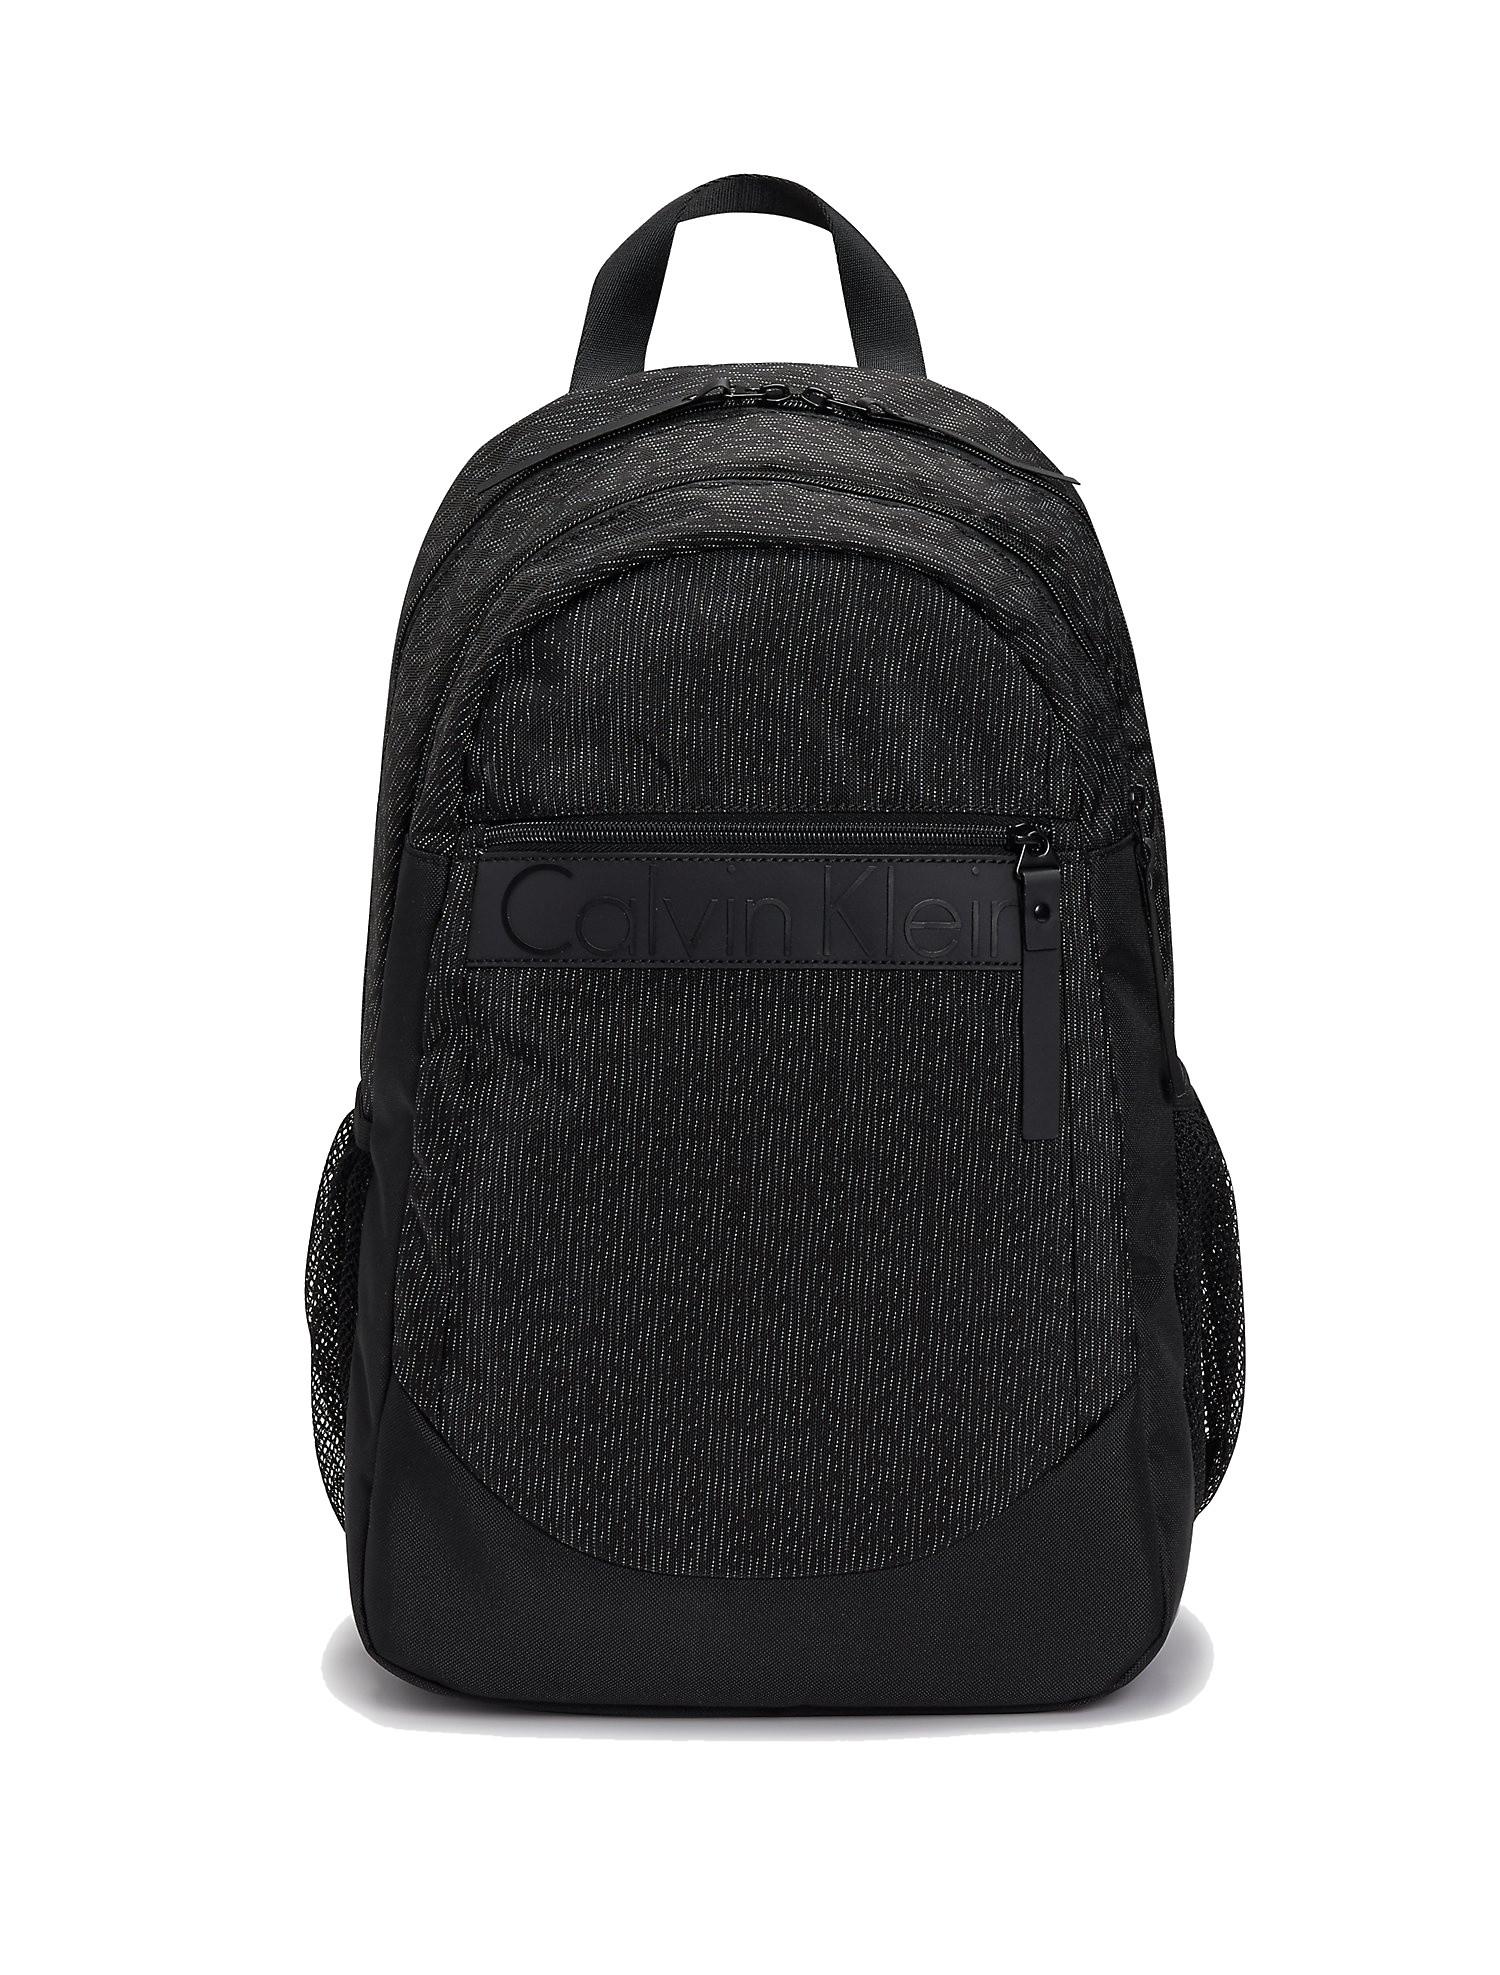 57a9acd744 Calvin Klein batoh černý 8270-001 - Glami.cz